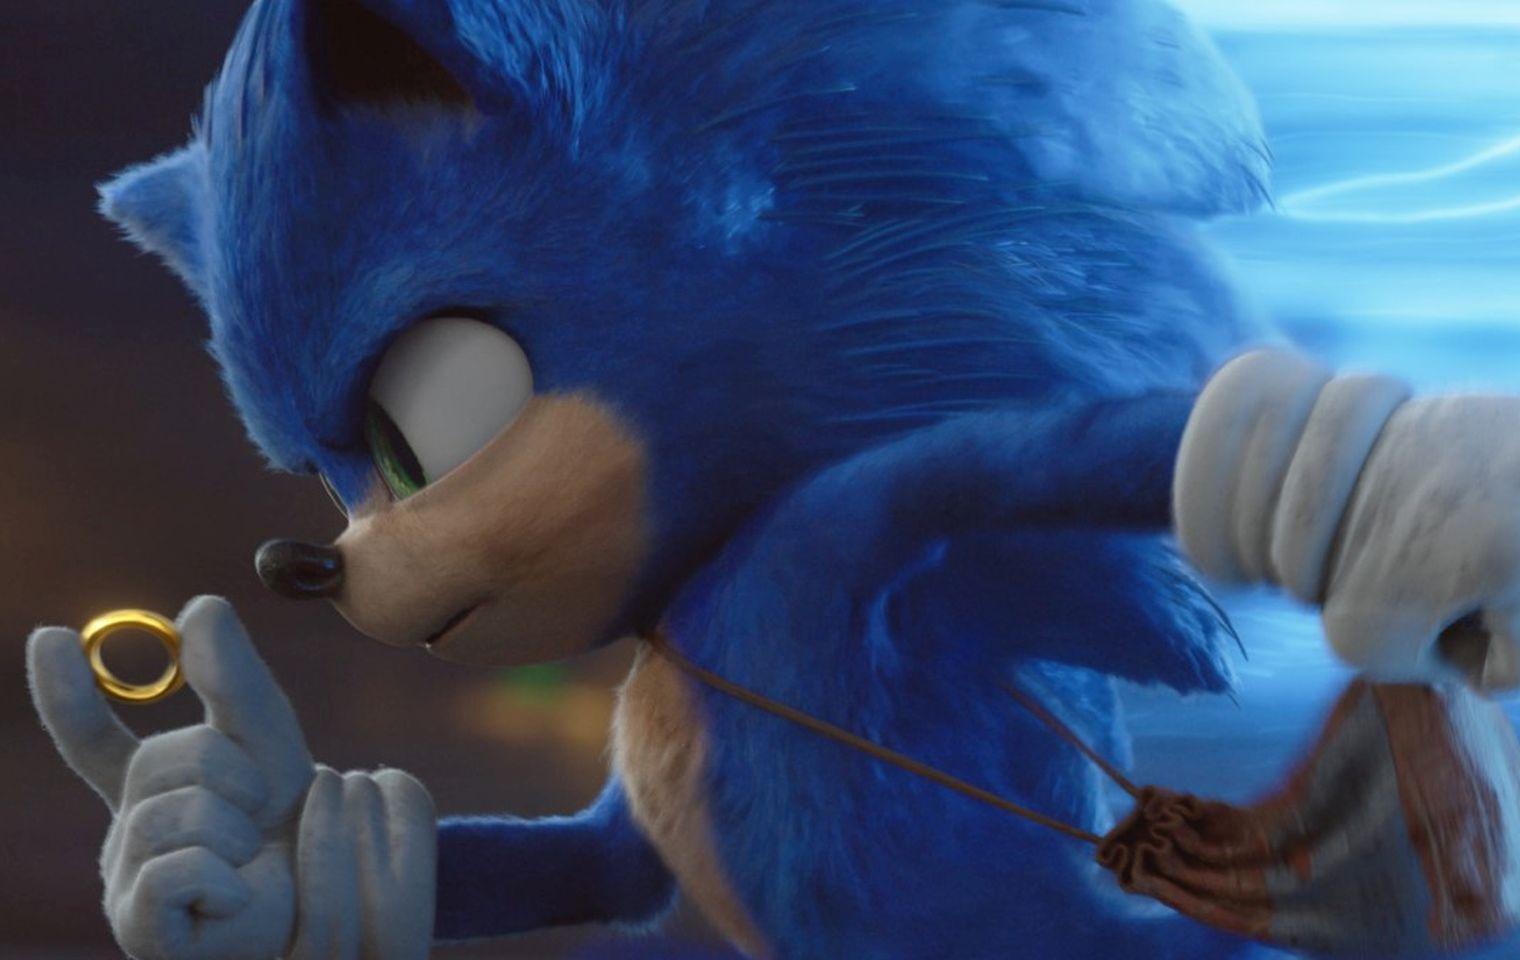 Sonic the Hedgehog Serie in Arbeit